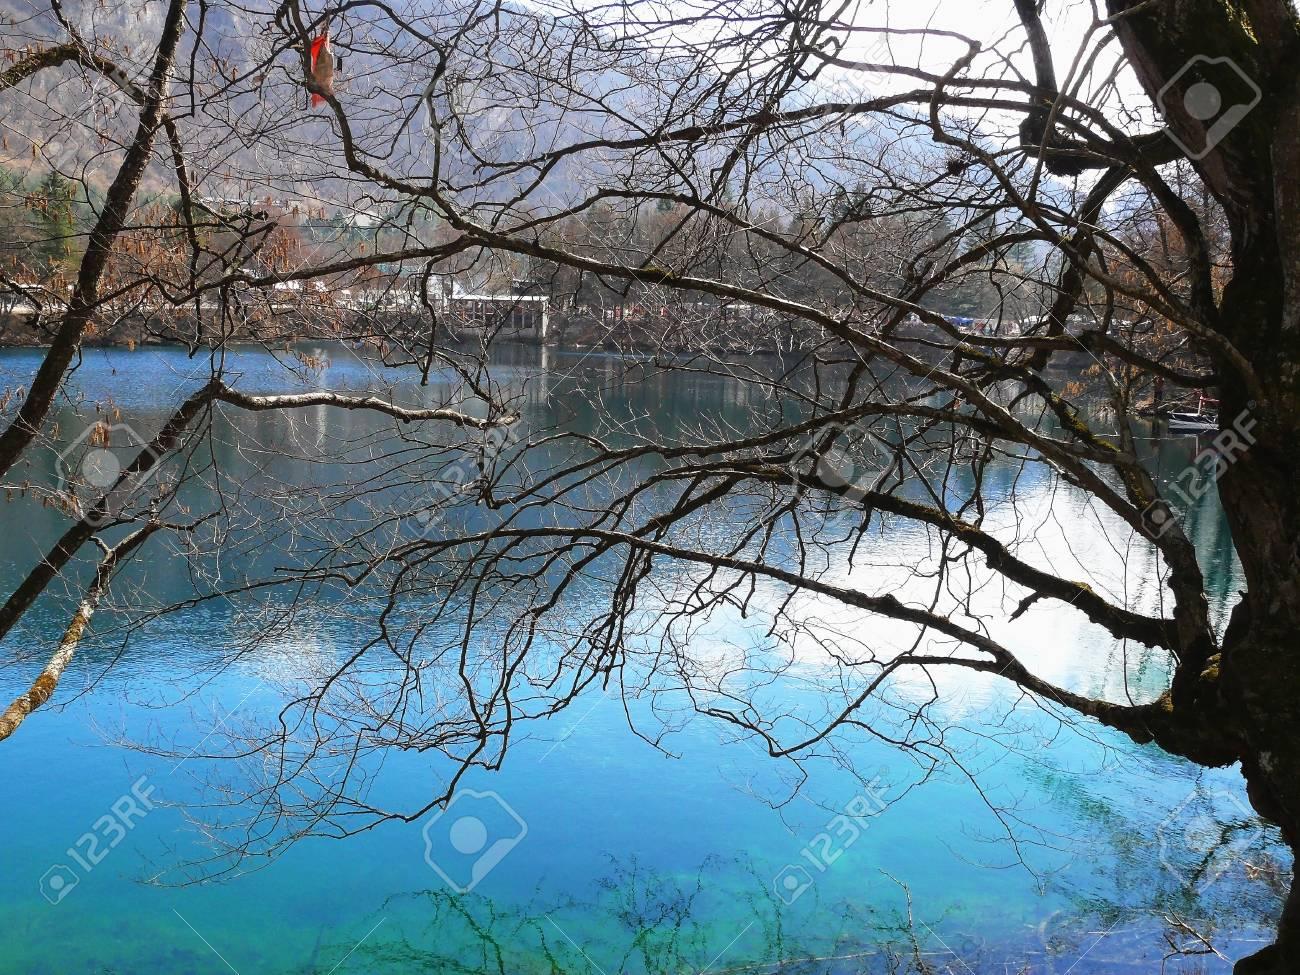 Kabardino-Balkaria. Blue Lakes where are located 74